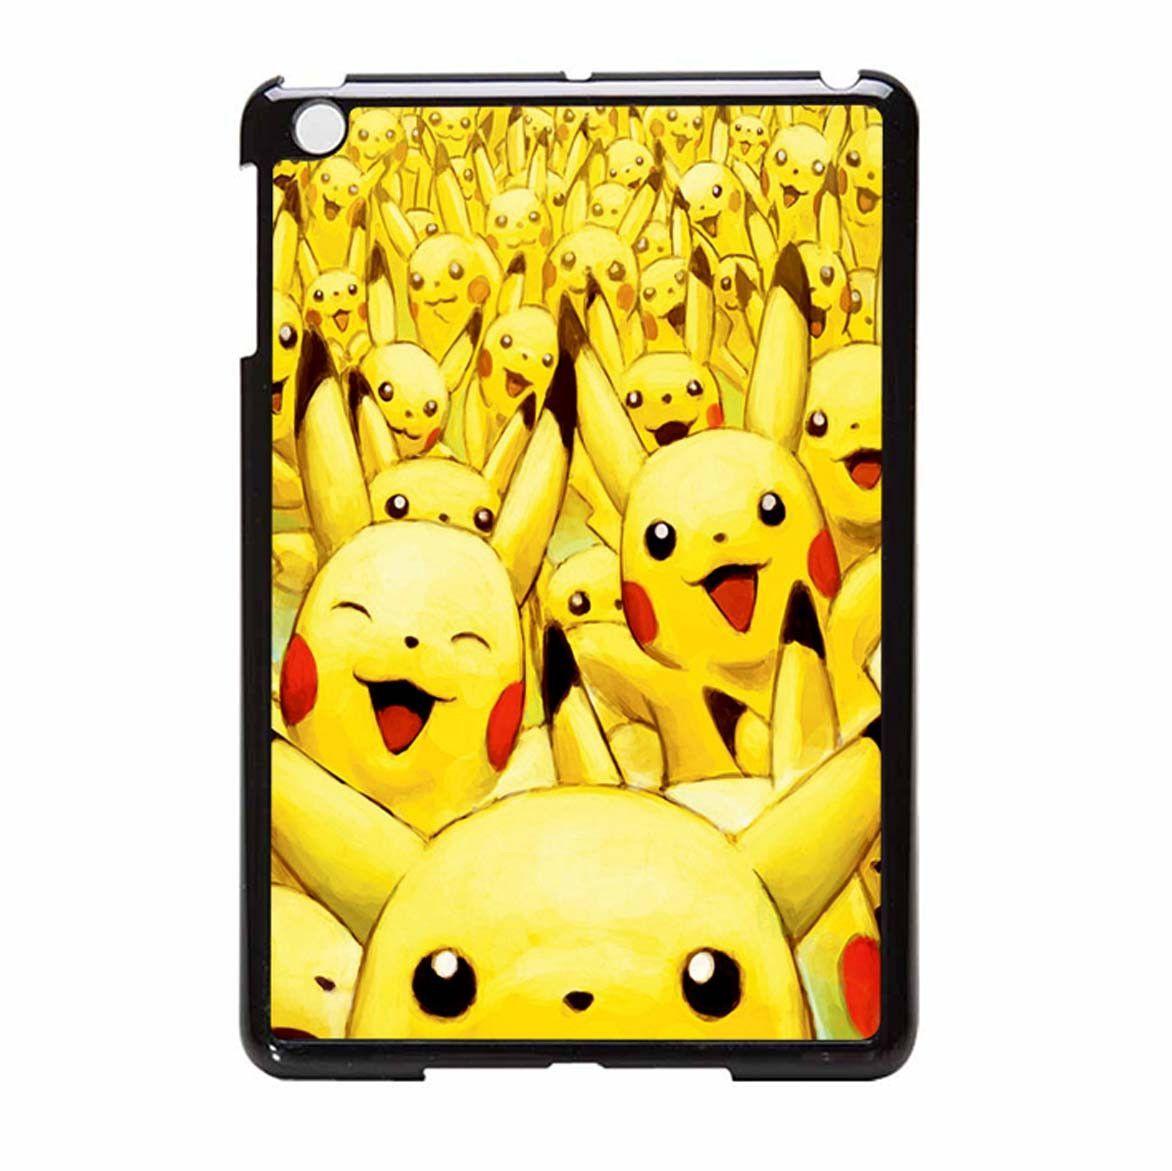 25 Pokemon Go, Pikachu & Pokeball iPhone 6 Wallpapers